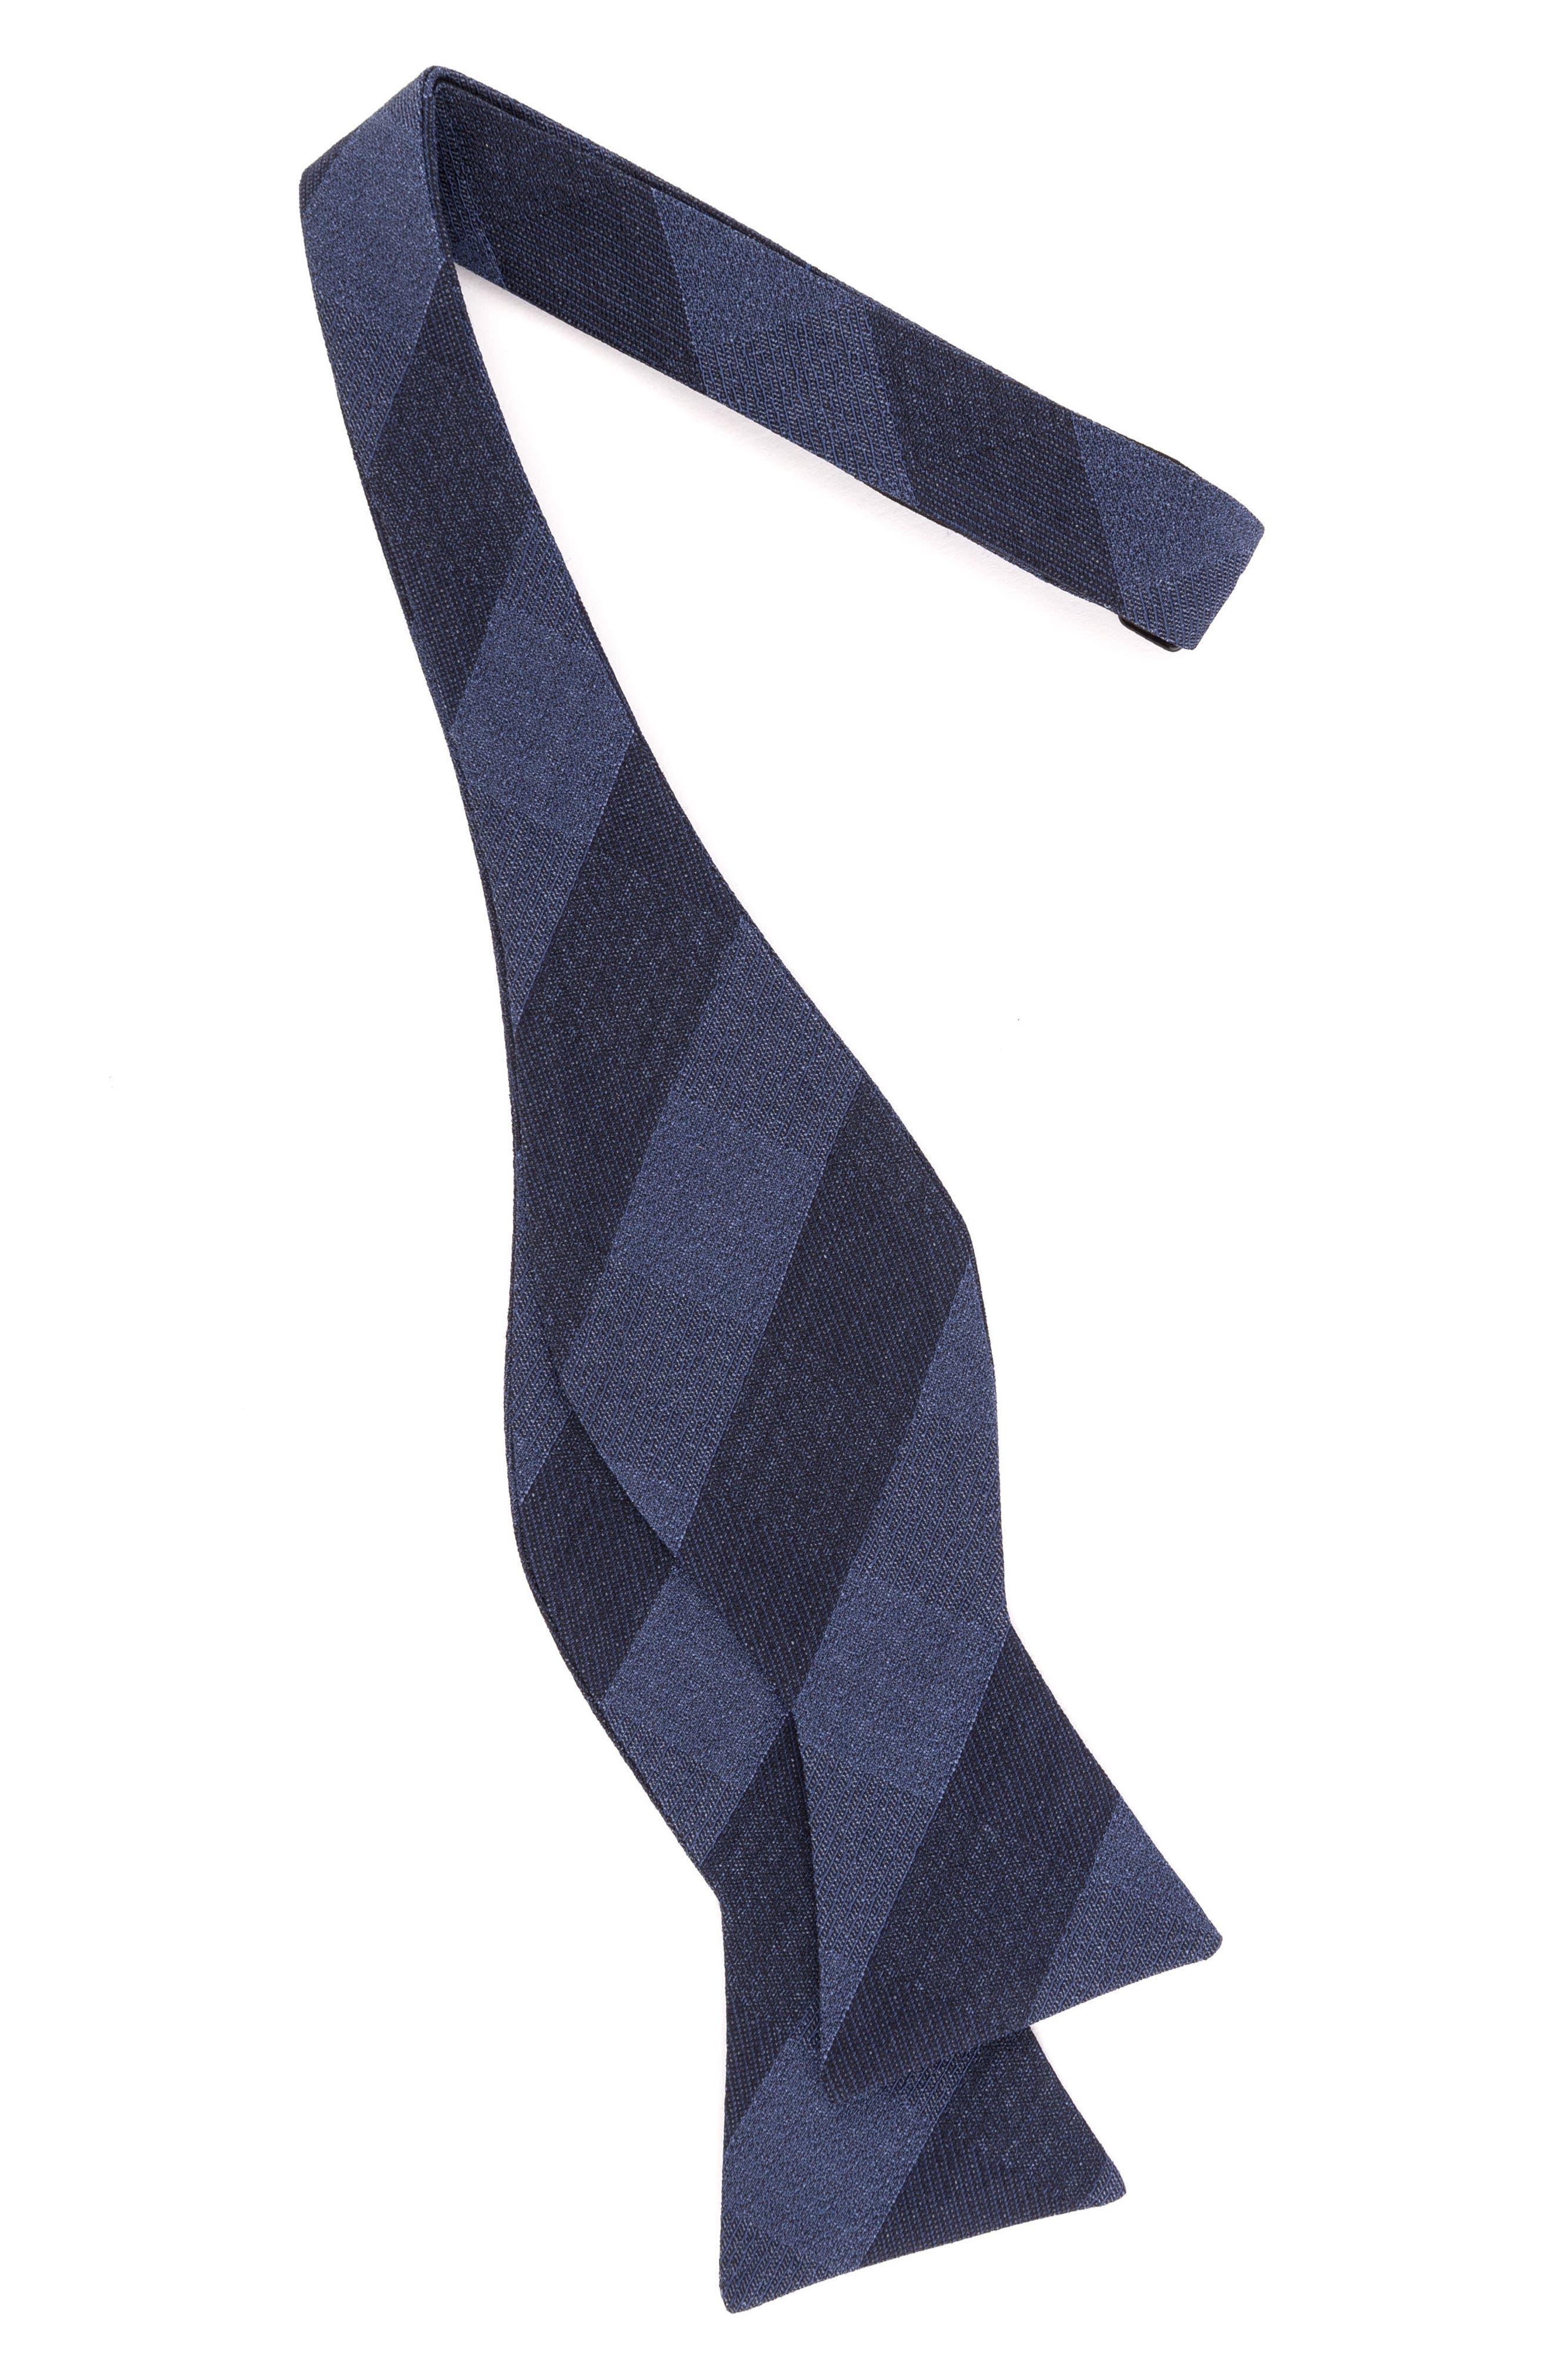 Indigo Wardrobe Silk Bow Tie,                             Alternate thumbnail 2, color,                             430